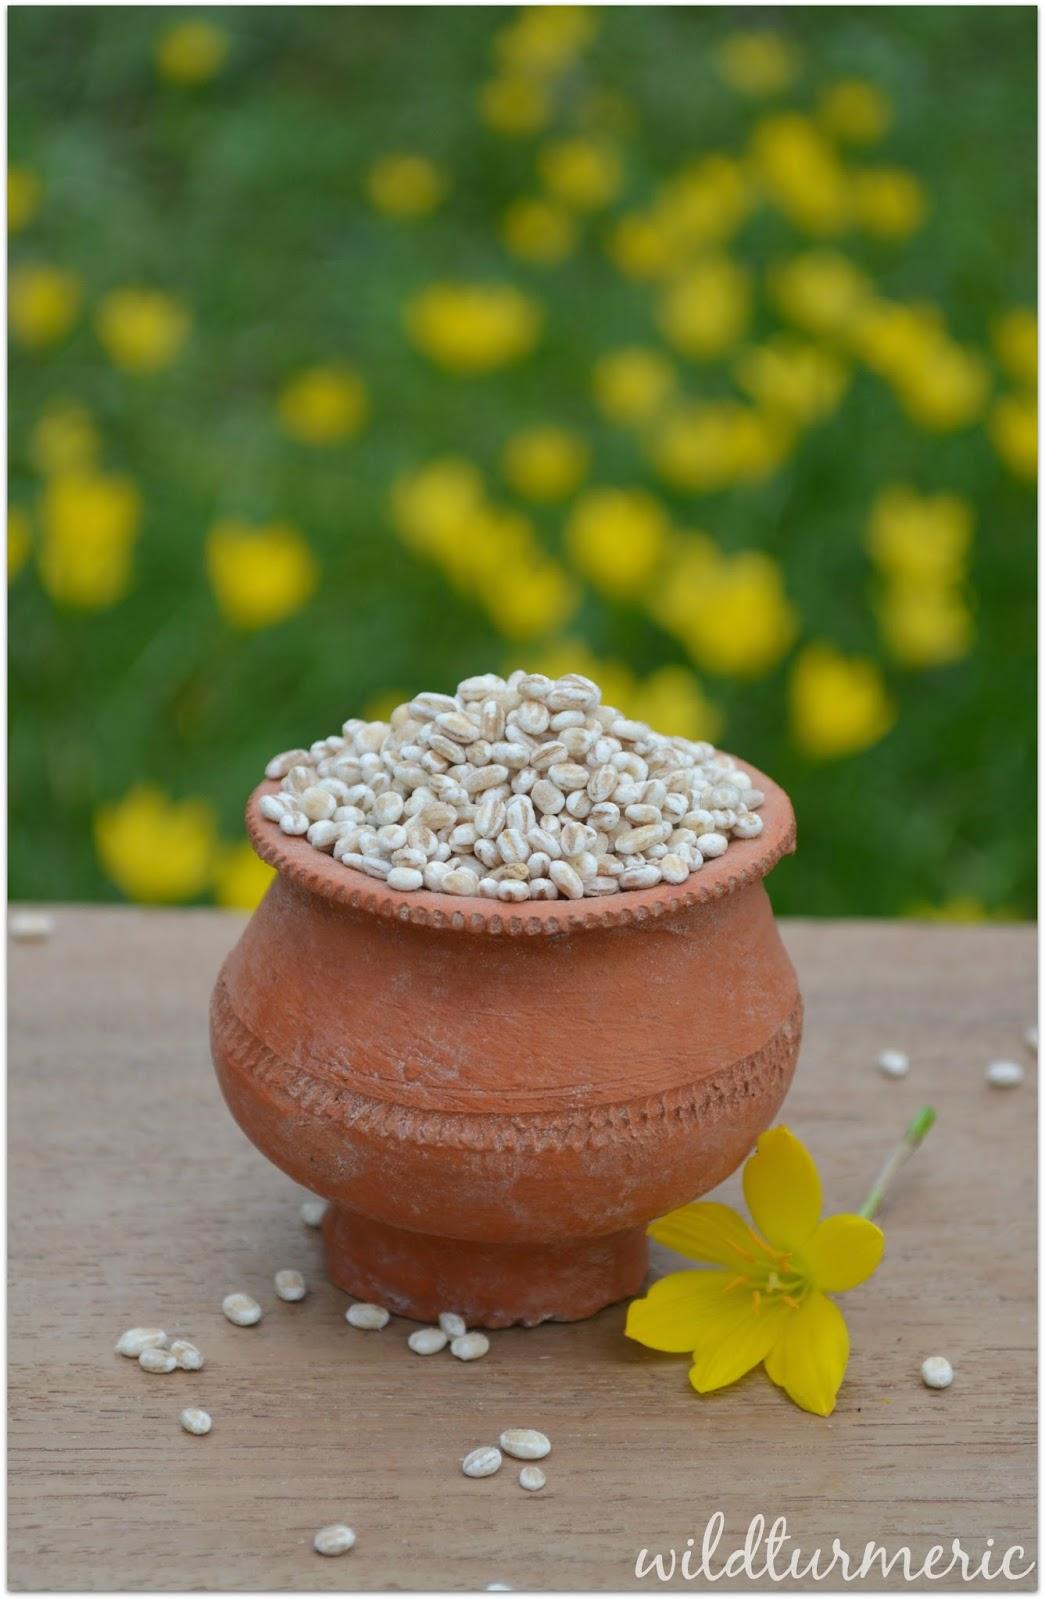 7 Top Health Benefits Of Barley   Jau For Weight Loss, Diabetes, Skin & Hair